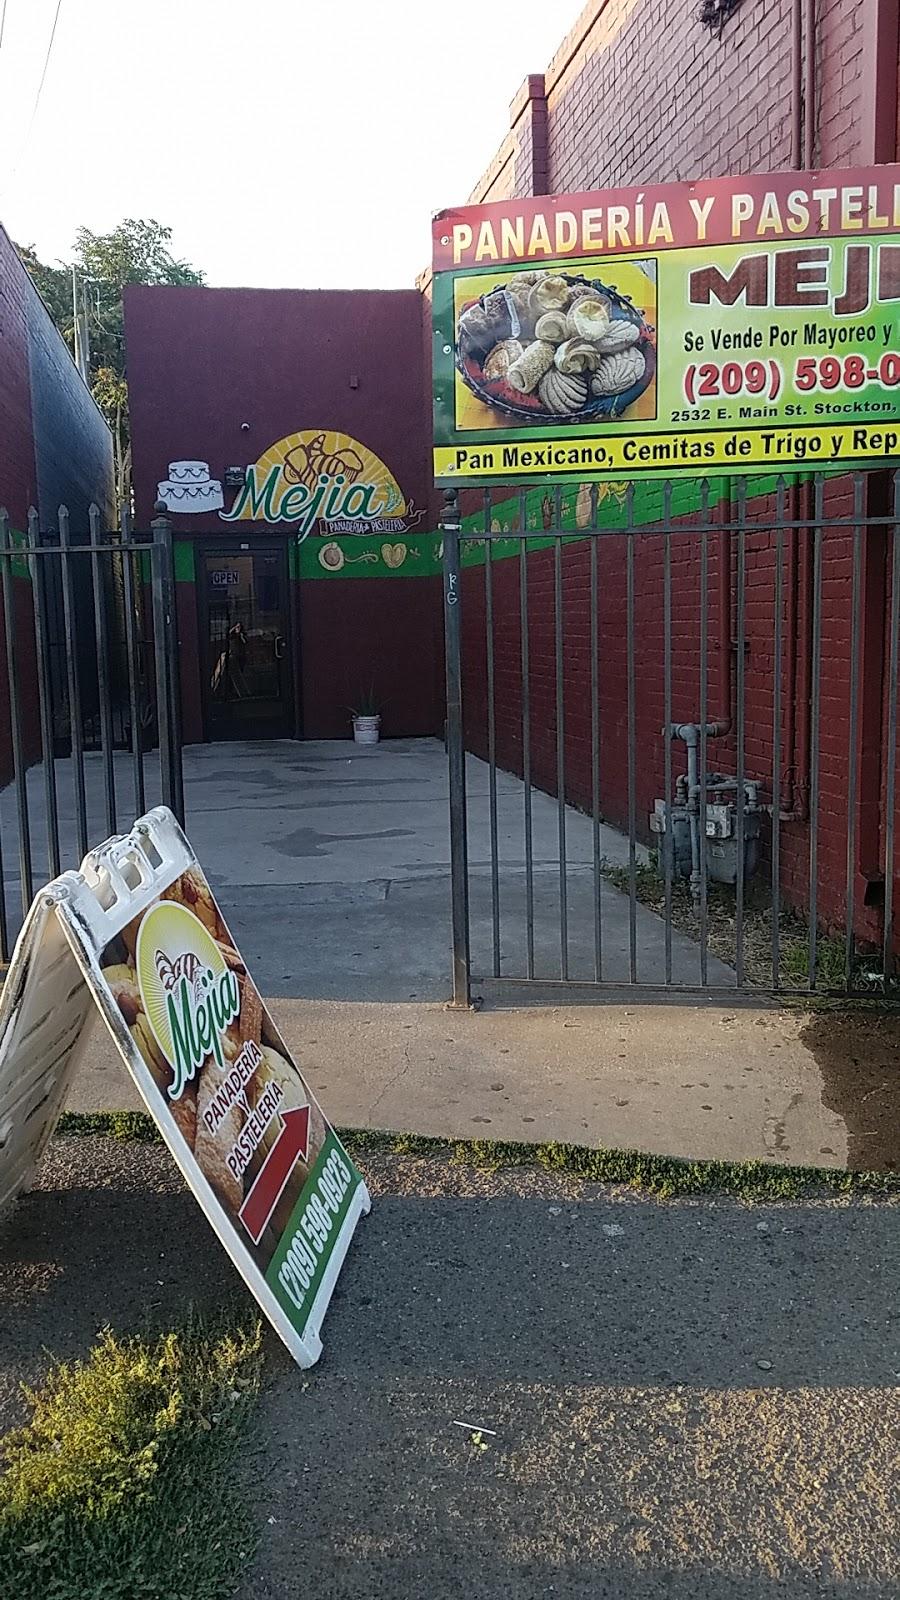 Panadería Mejía - bakery  | Photo 4 of 6 | Address: 2556 E Main St, Stockton, CA 95205, USA | Phone: (209) 636-4195